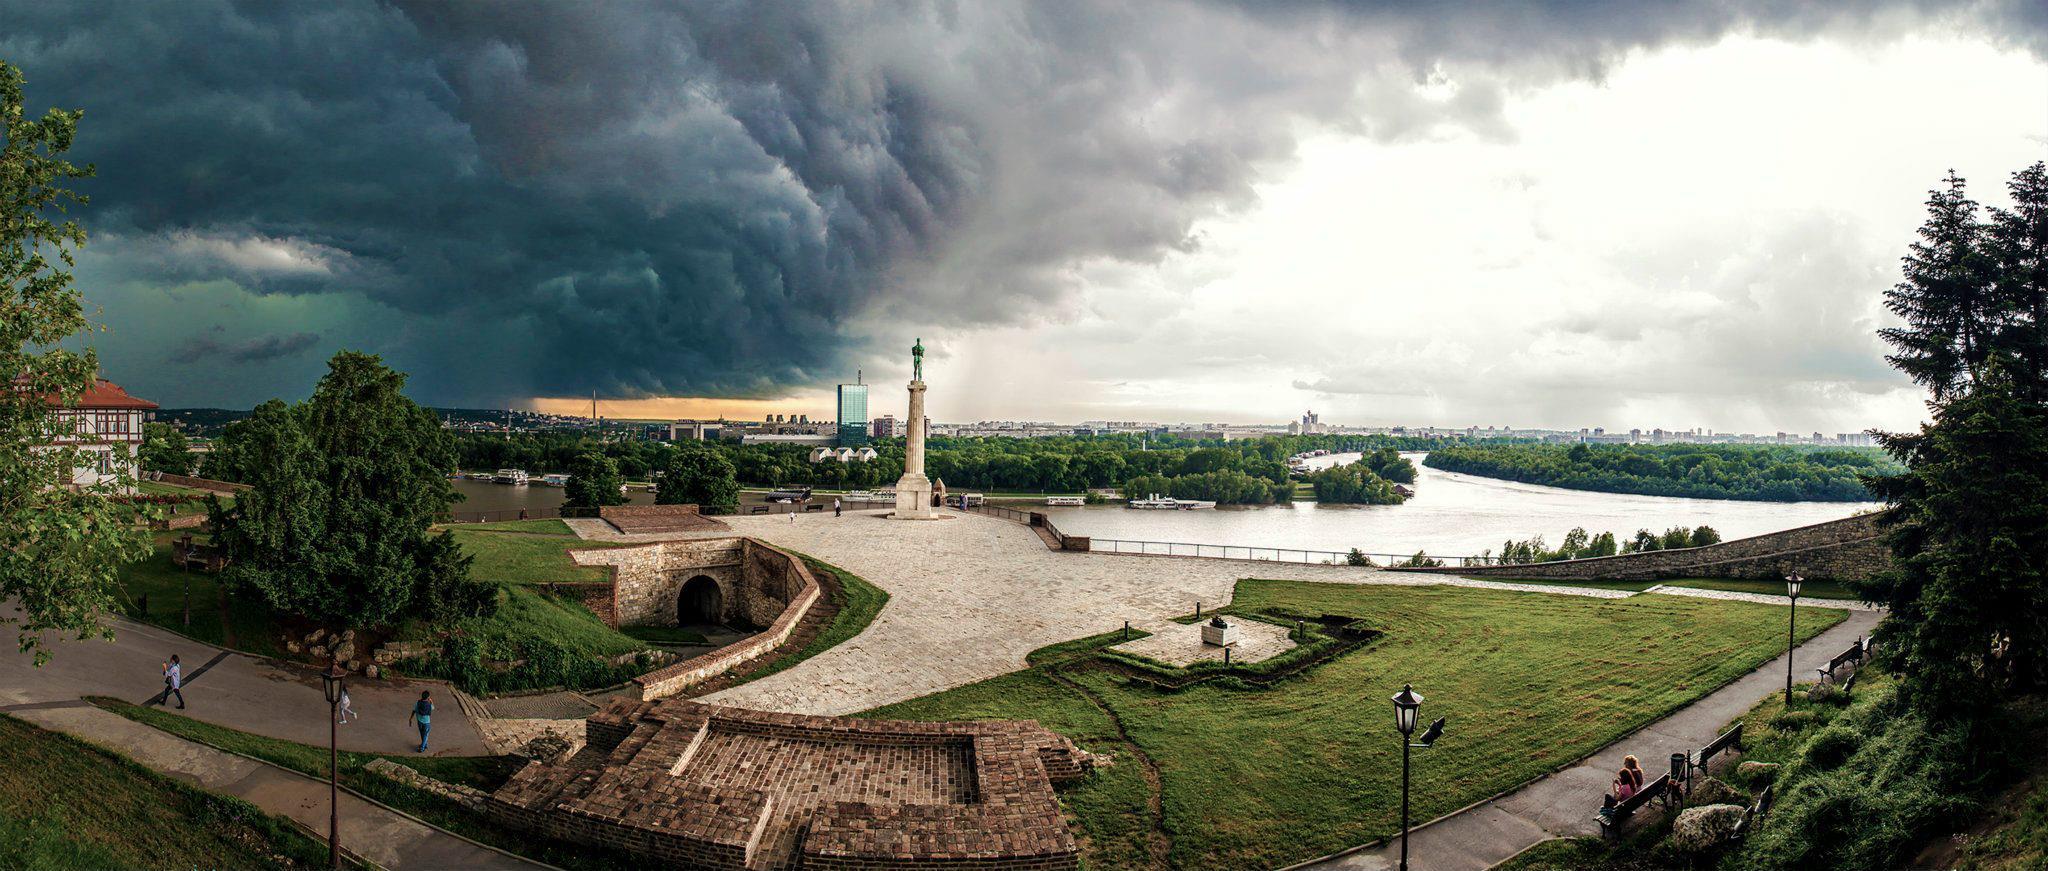 Šetnja Beogradom: Stvarno najlepše mesto od davnina